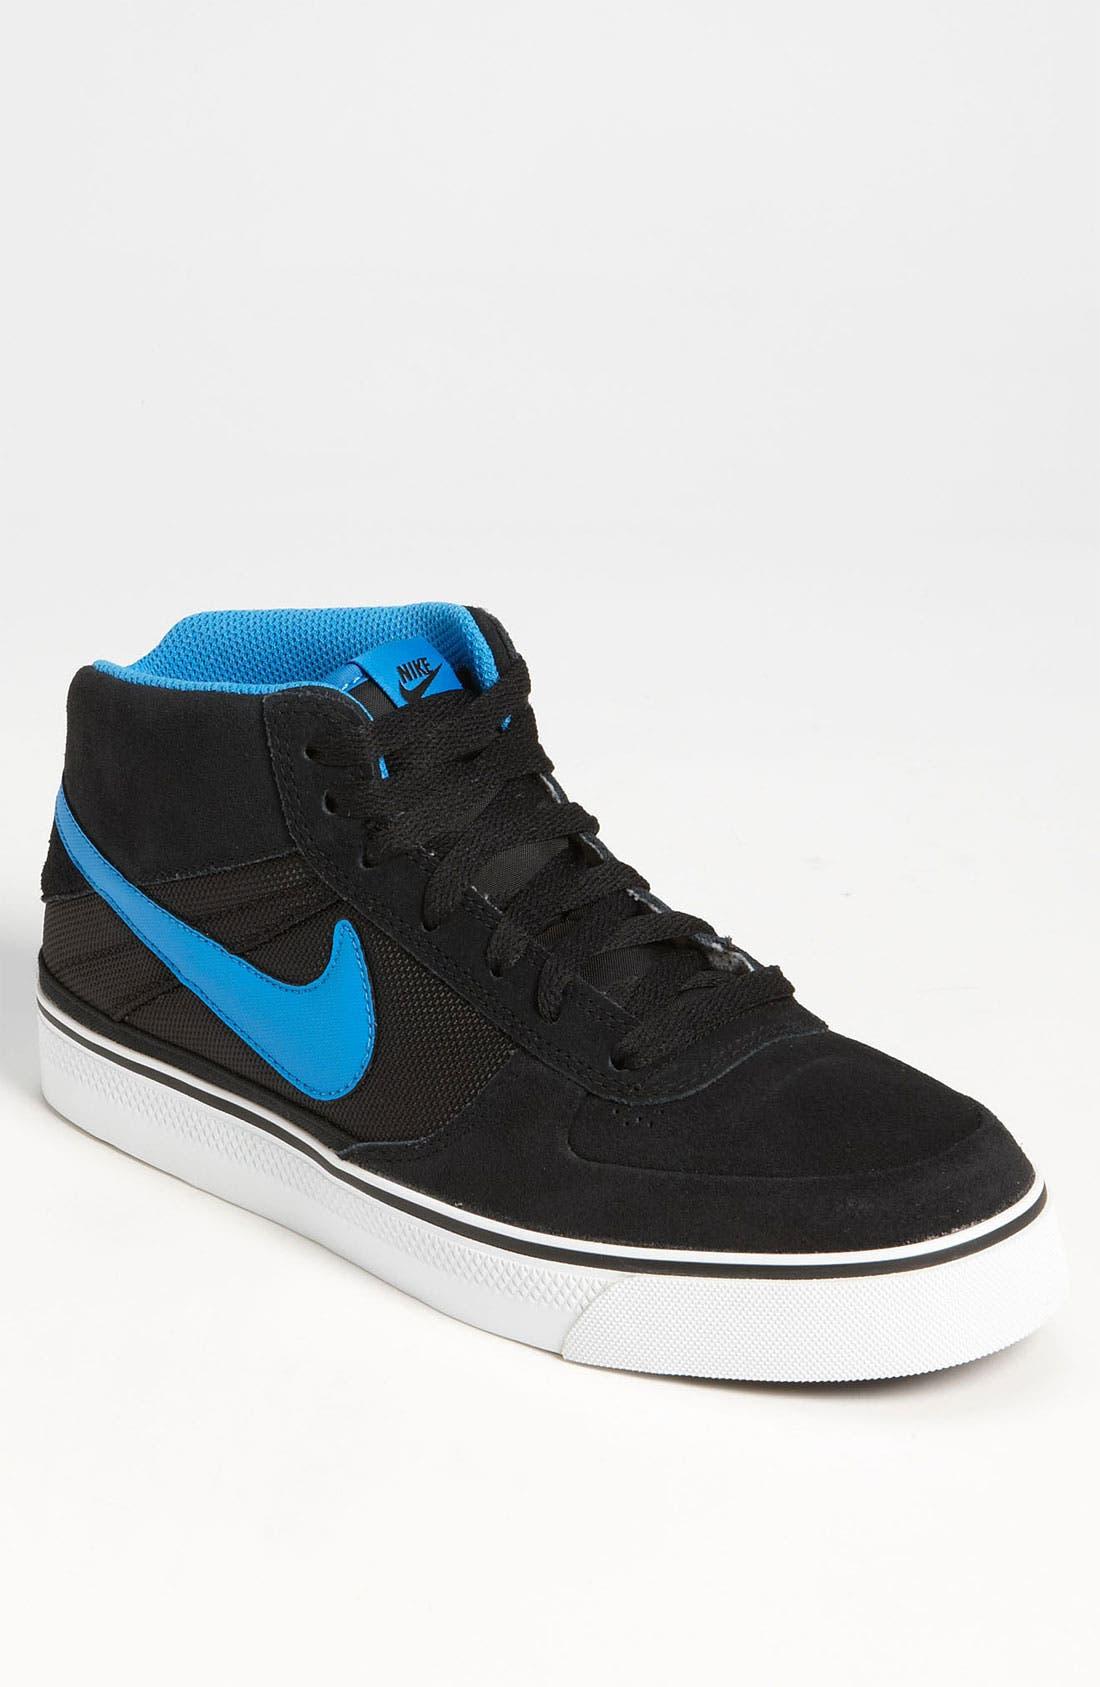 NIKE 'Mavrk Mid 2' Sneaker, Main, color, 004